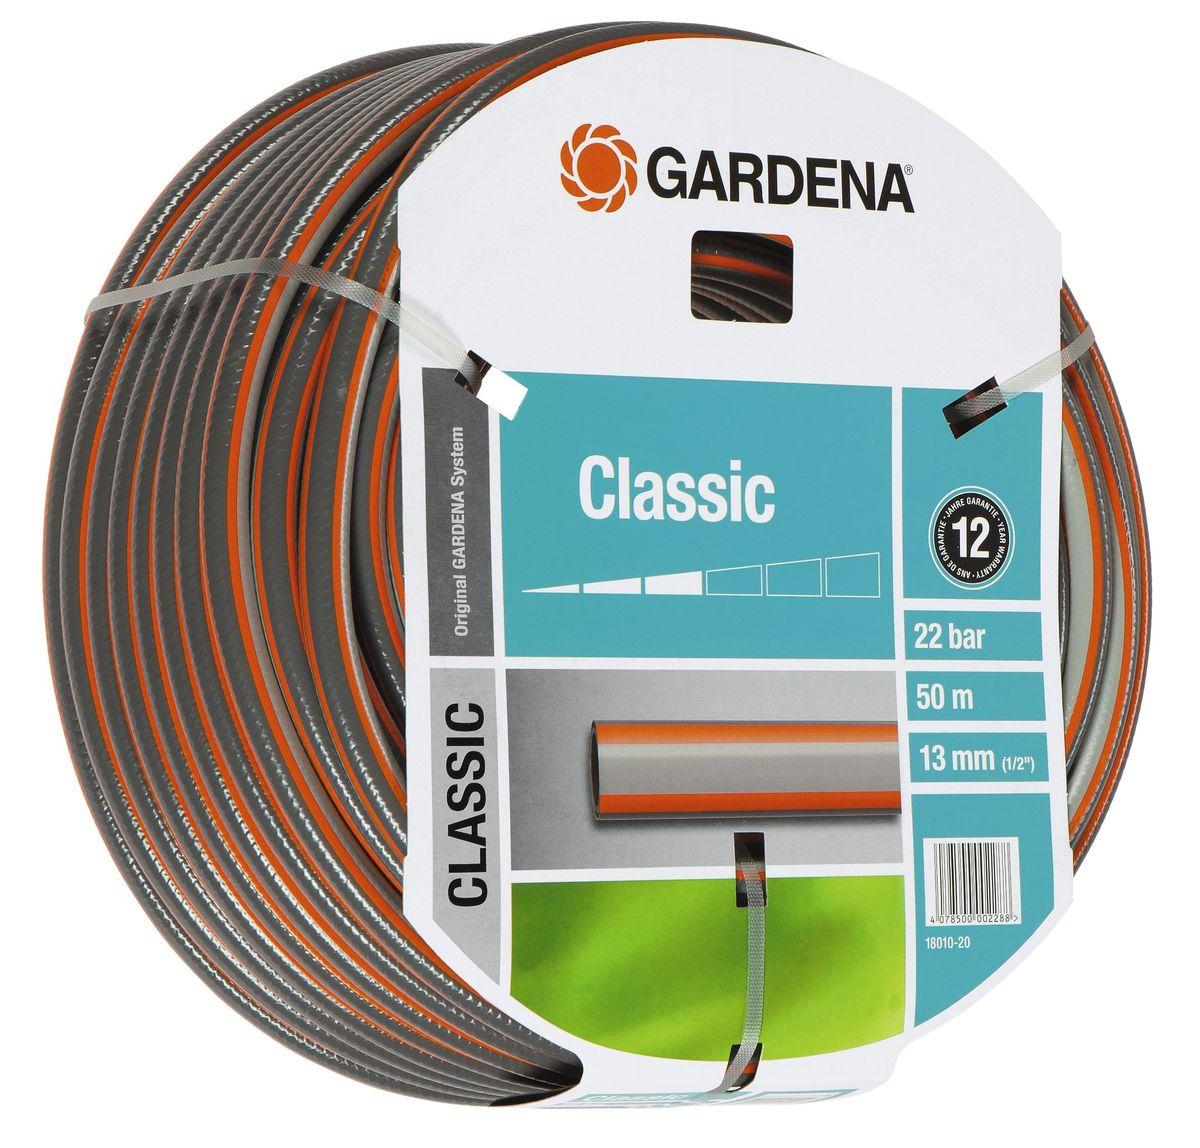 Шланг Gardena Classic, 13 мм (1/2) х 50 м шланг gardena сочащийся для наземной прокладки 13 мм 1 2 х 50 м с фитингами 13013 20 000 00